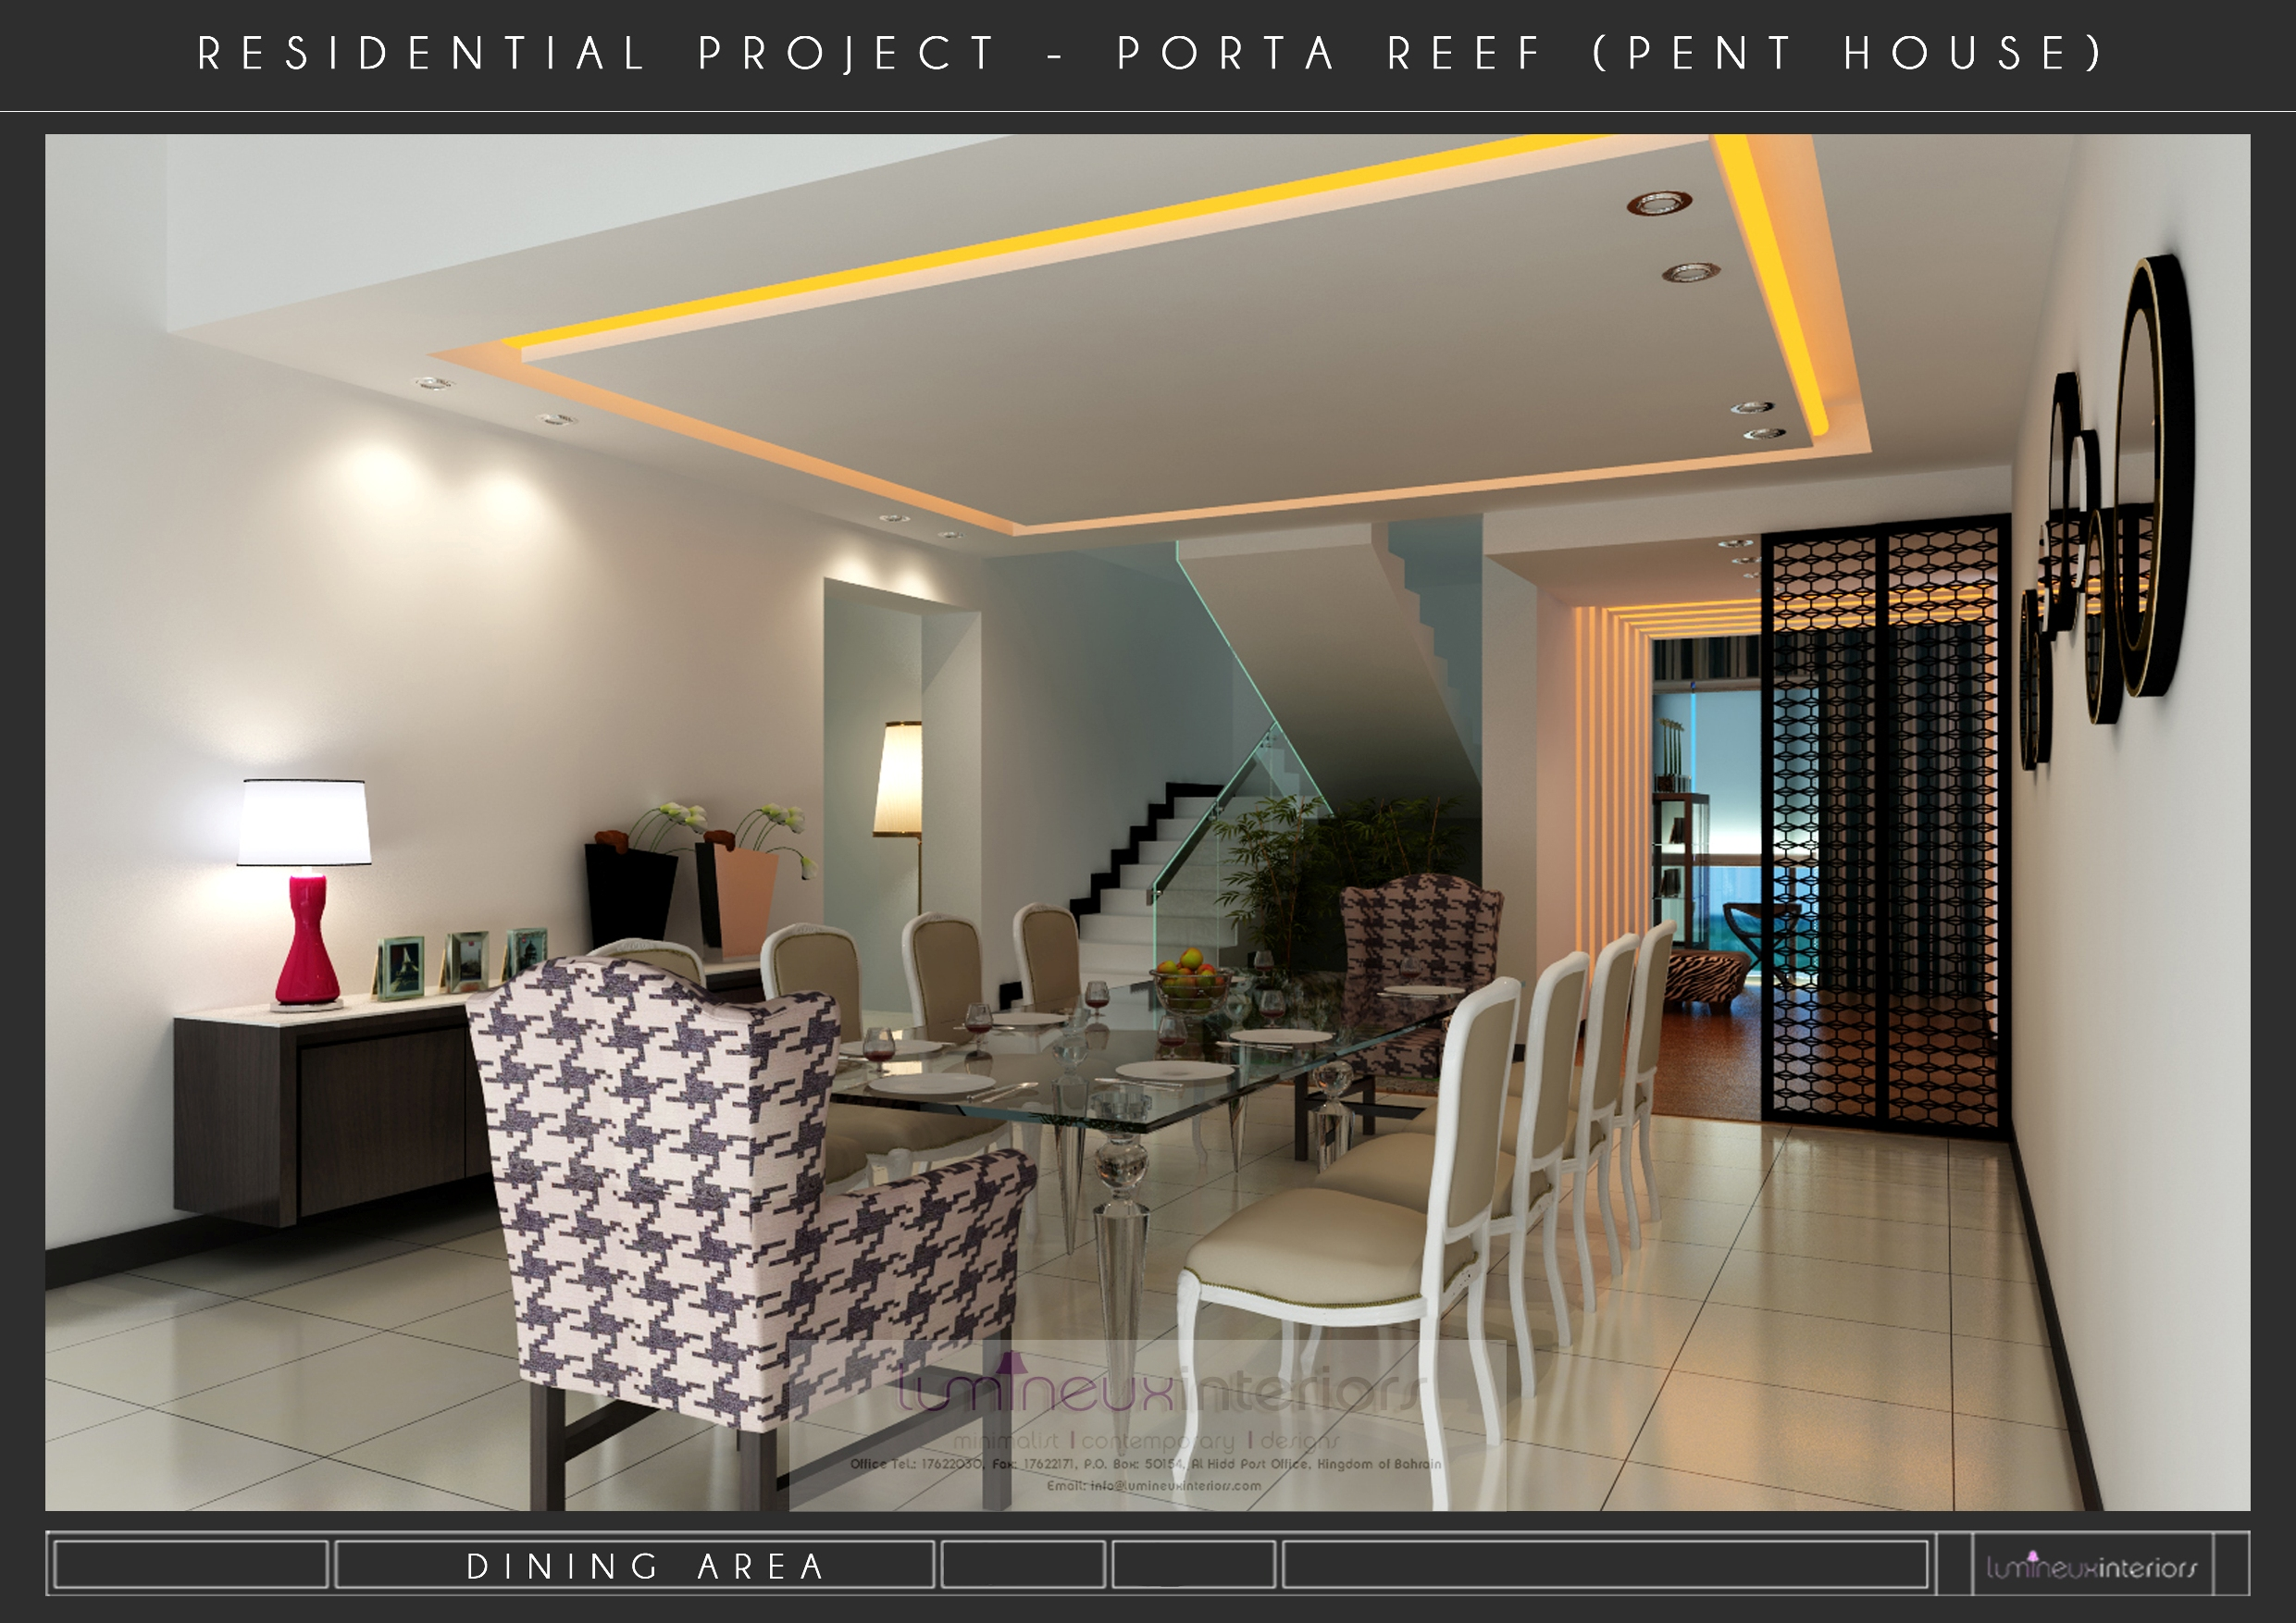 Porta Reef (PENT HOUSE)